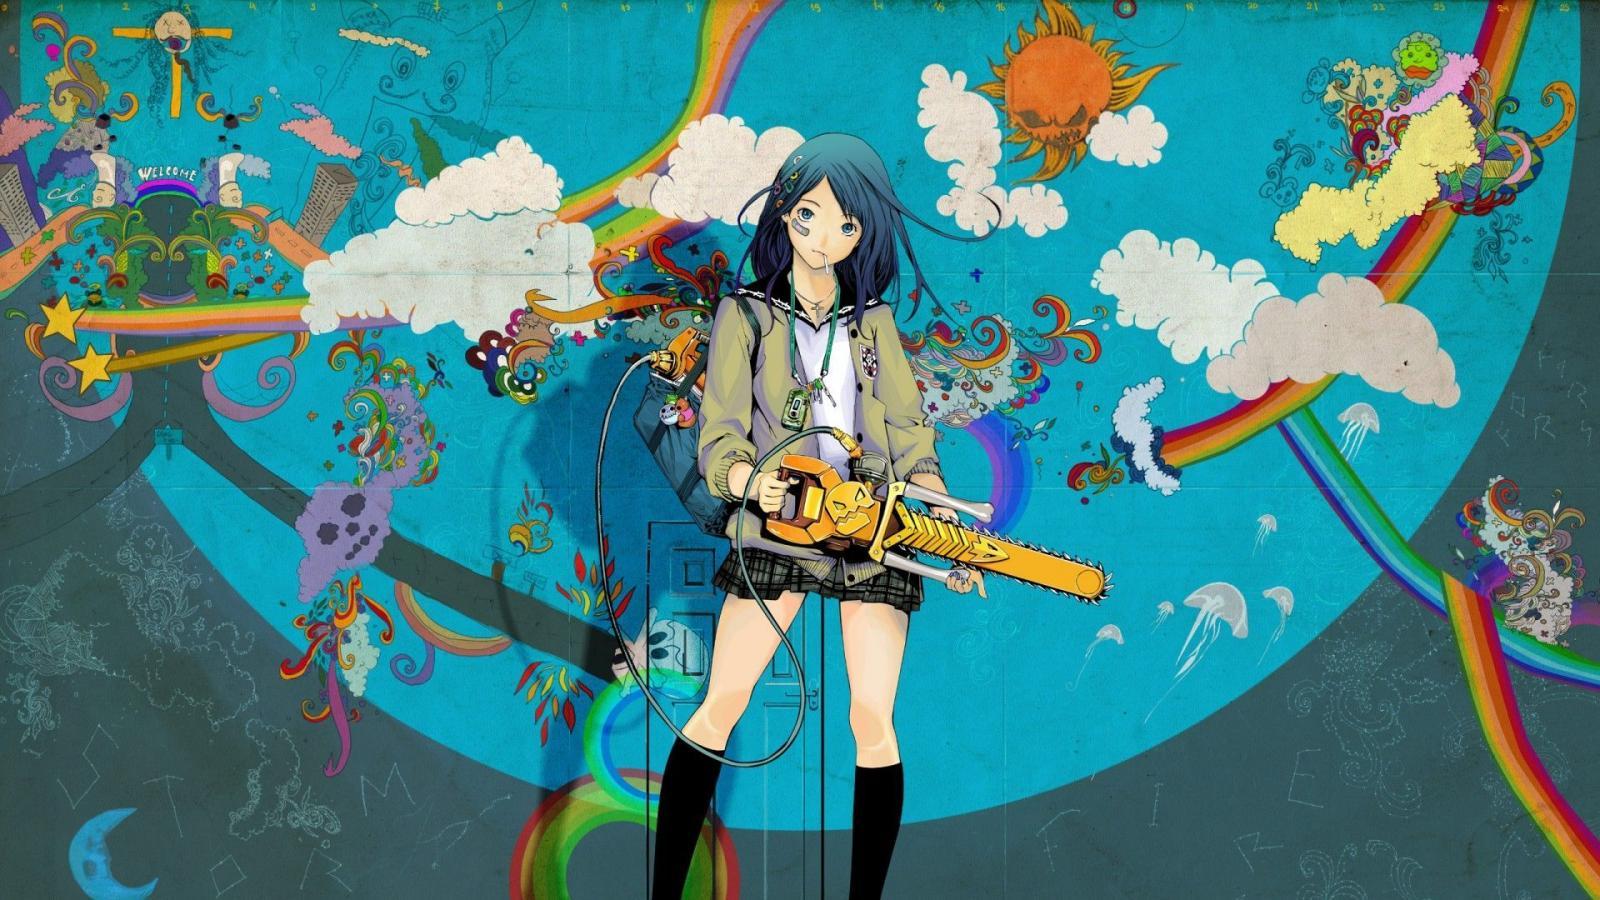 Hd 1600x900 anime wallpaper wallpapersafari - Wallpapers hd anime ...